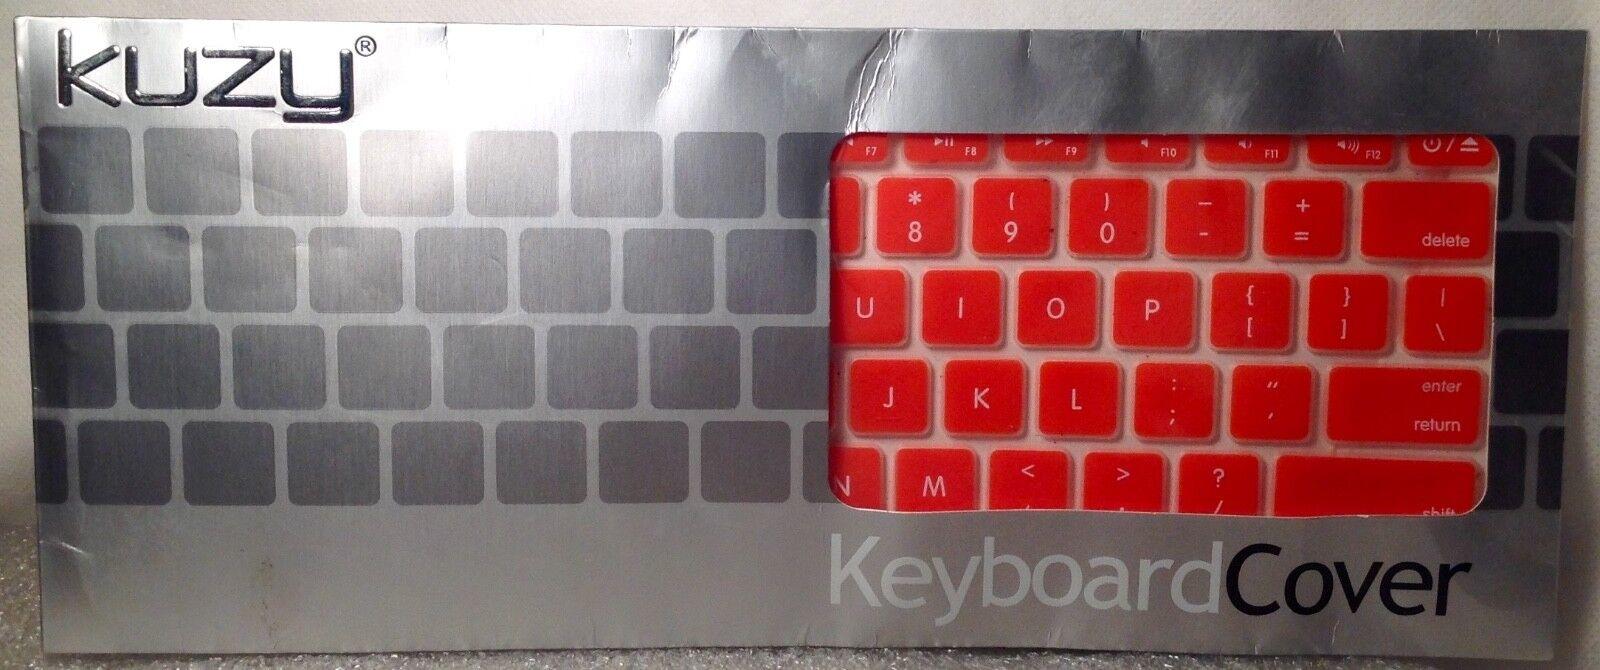 KUZY Keyboard Cover ORANGE Silcone for MacBook NEW